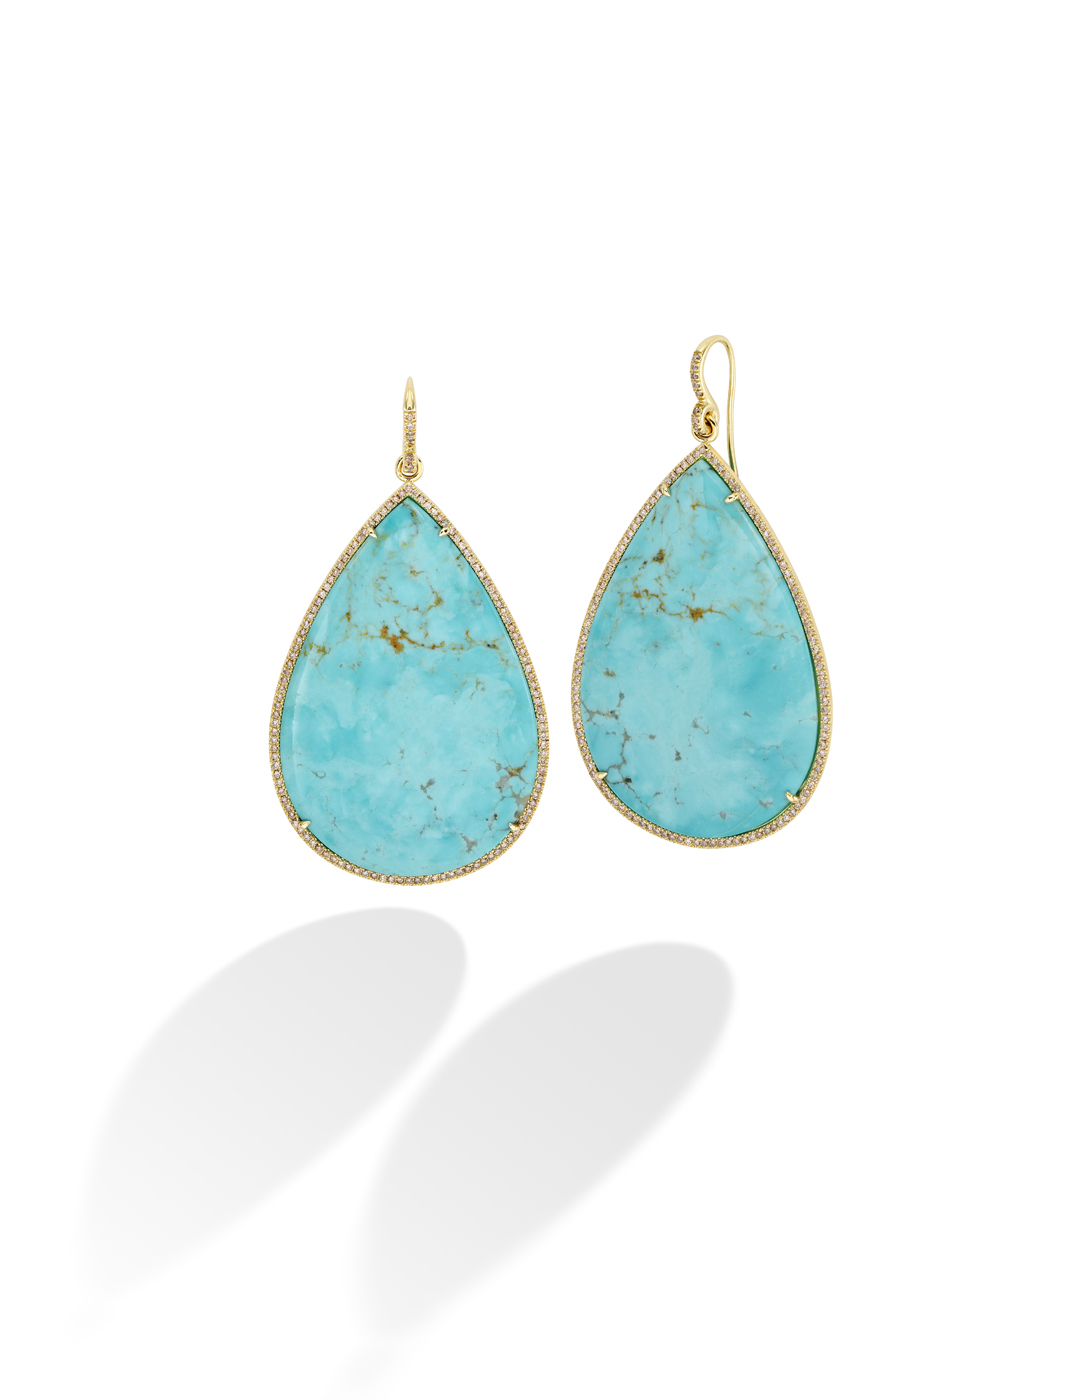 mish_products_earrings_Lexington-Turq-ER-1